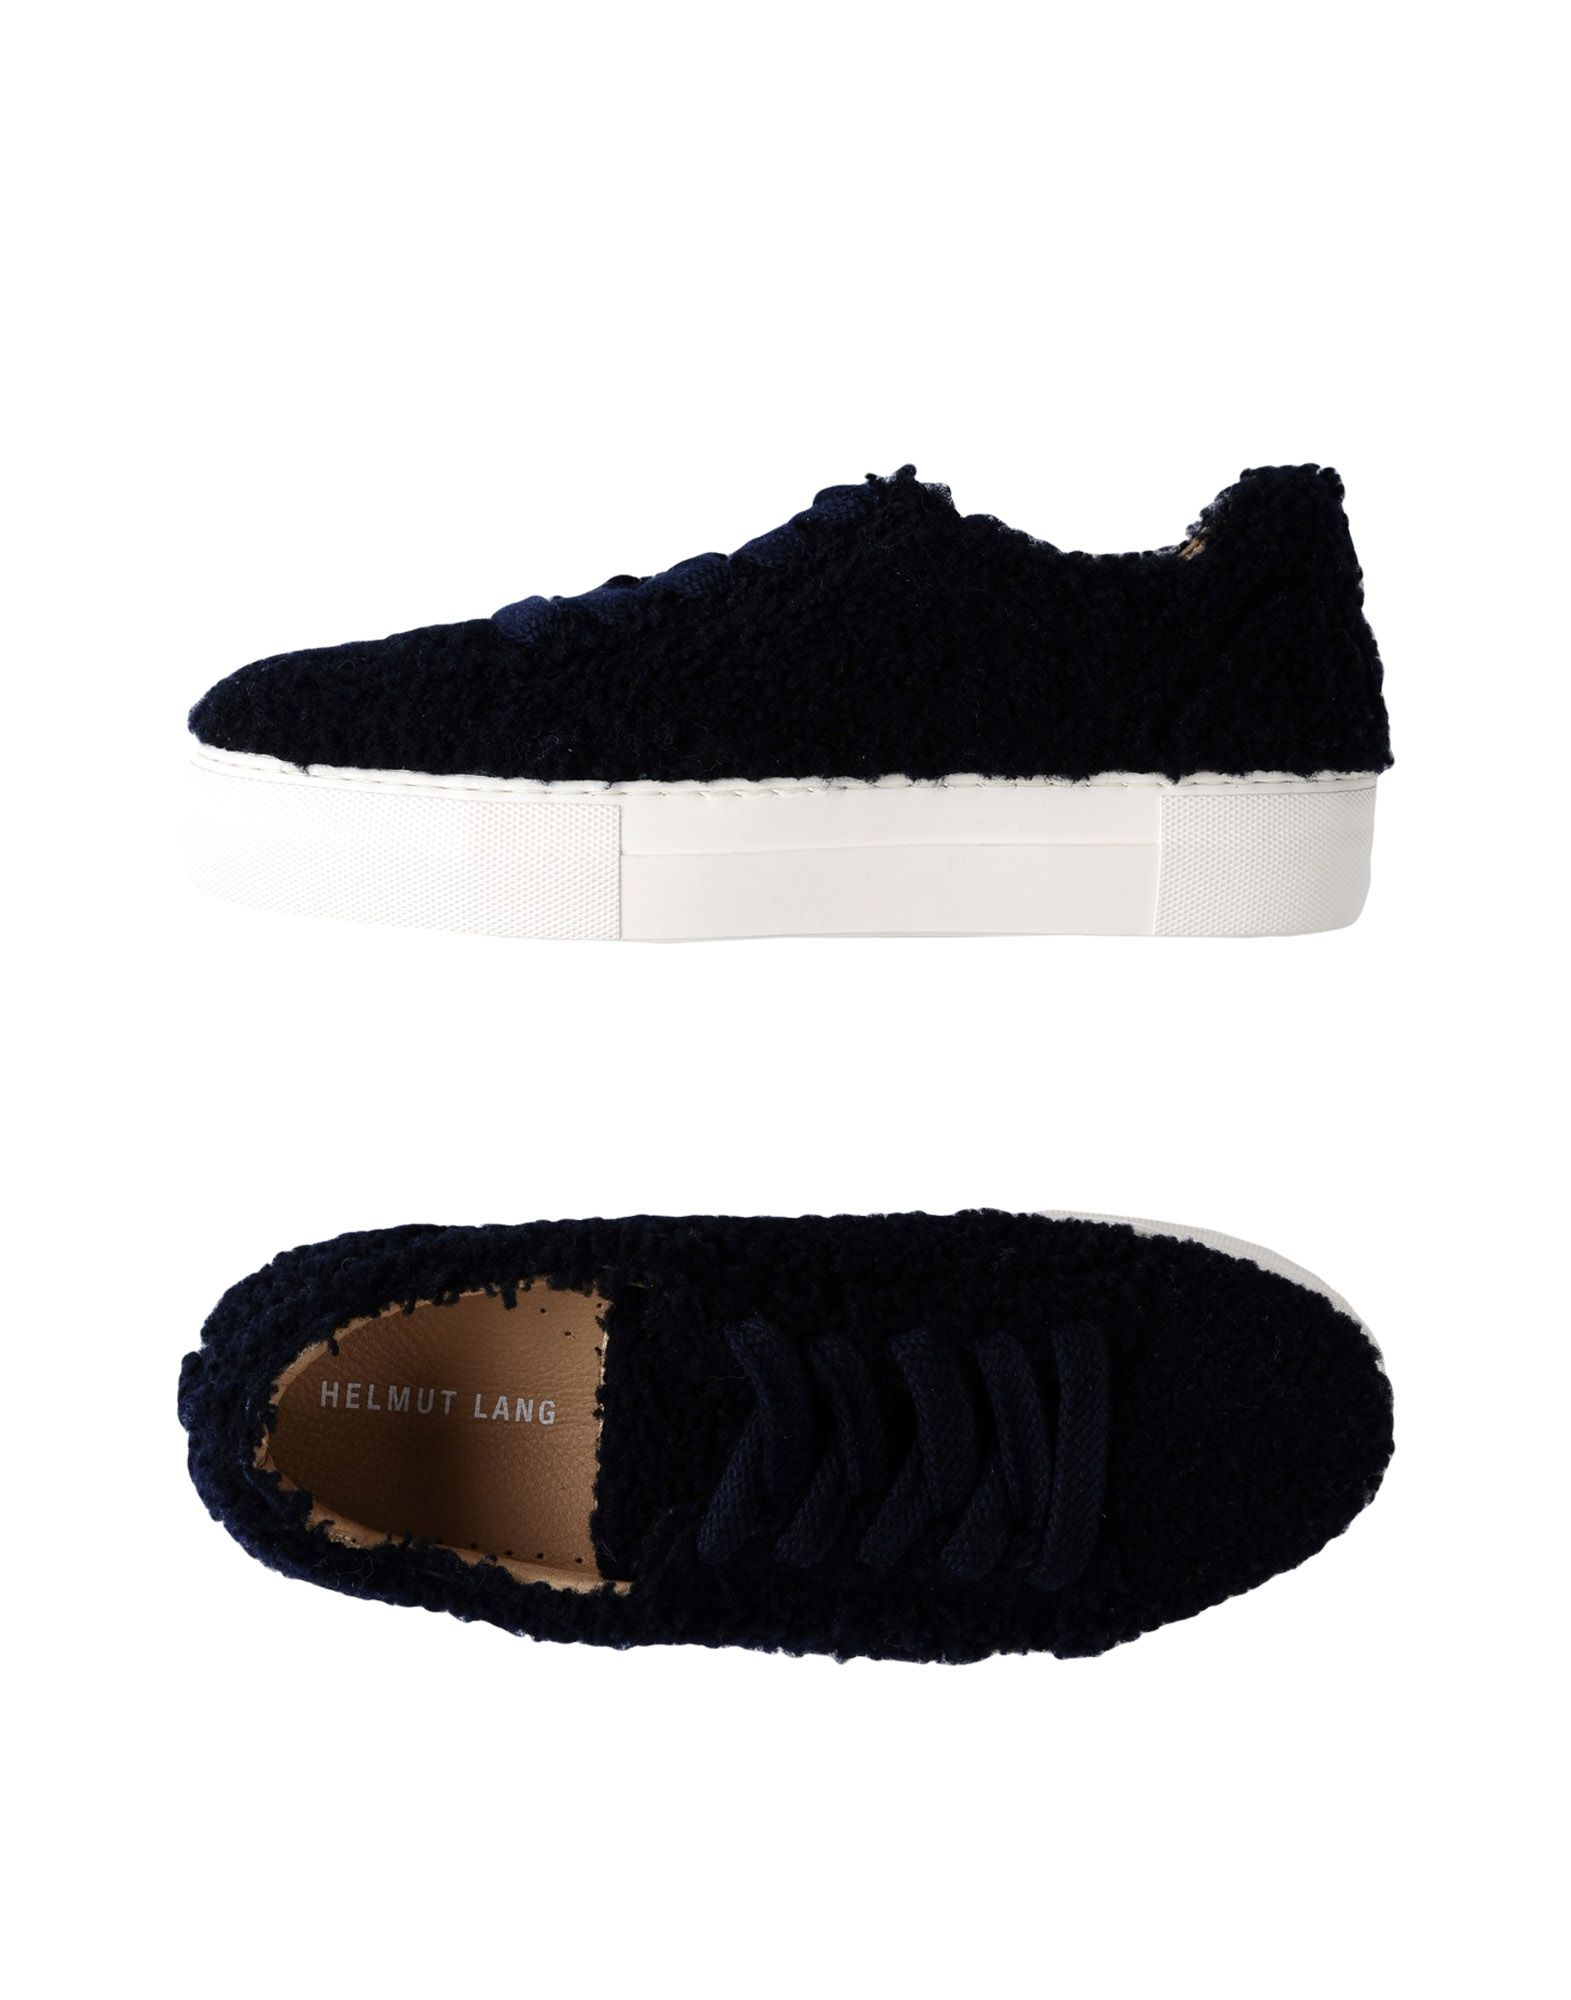 Sneakers Helmut Donna Lang Donna Helmut - 11344970OD 3501d4